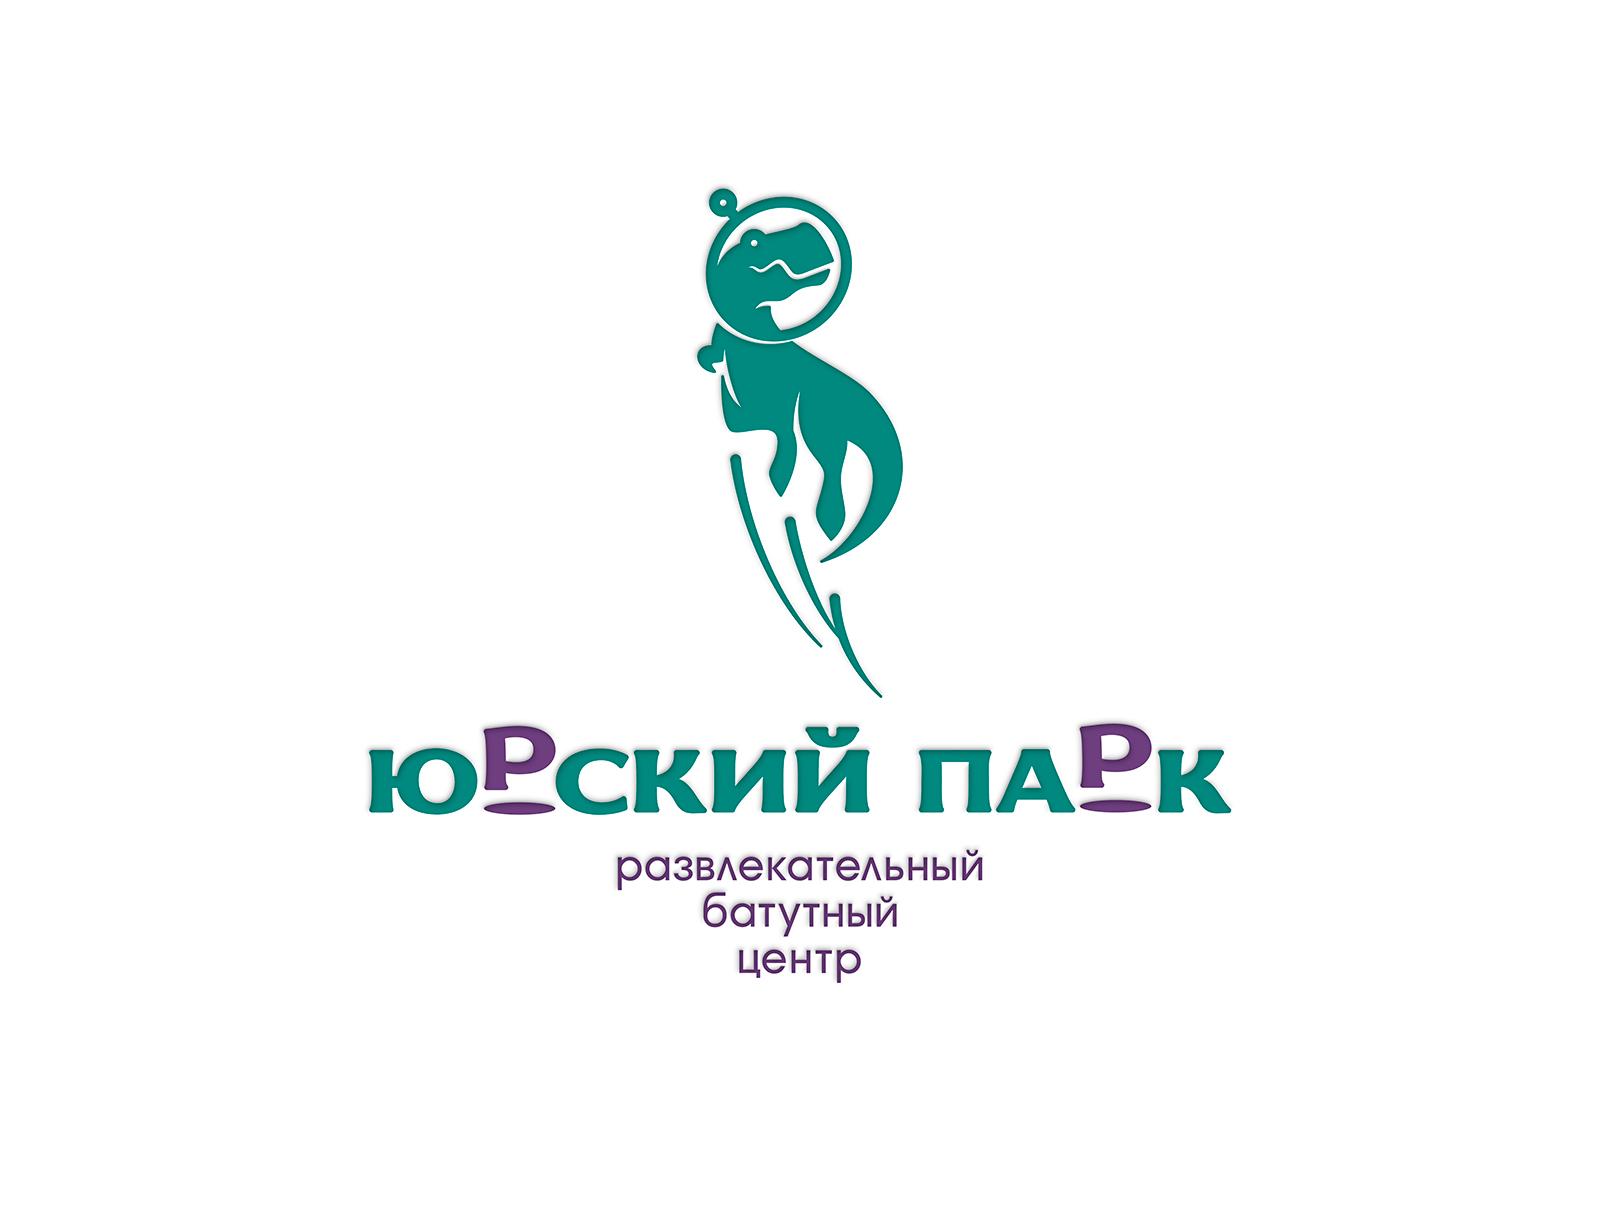 Юрский парк